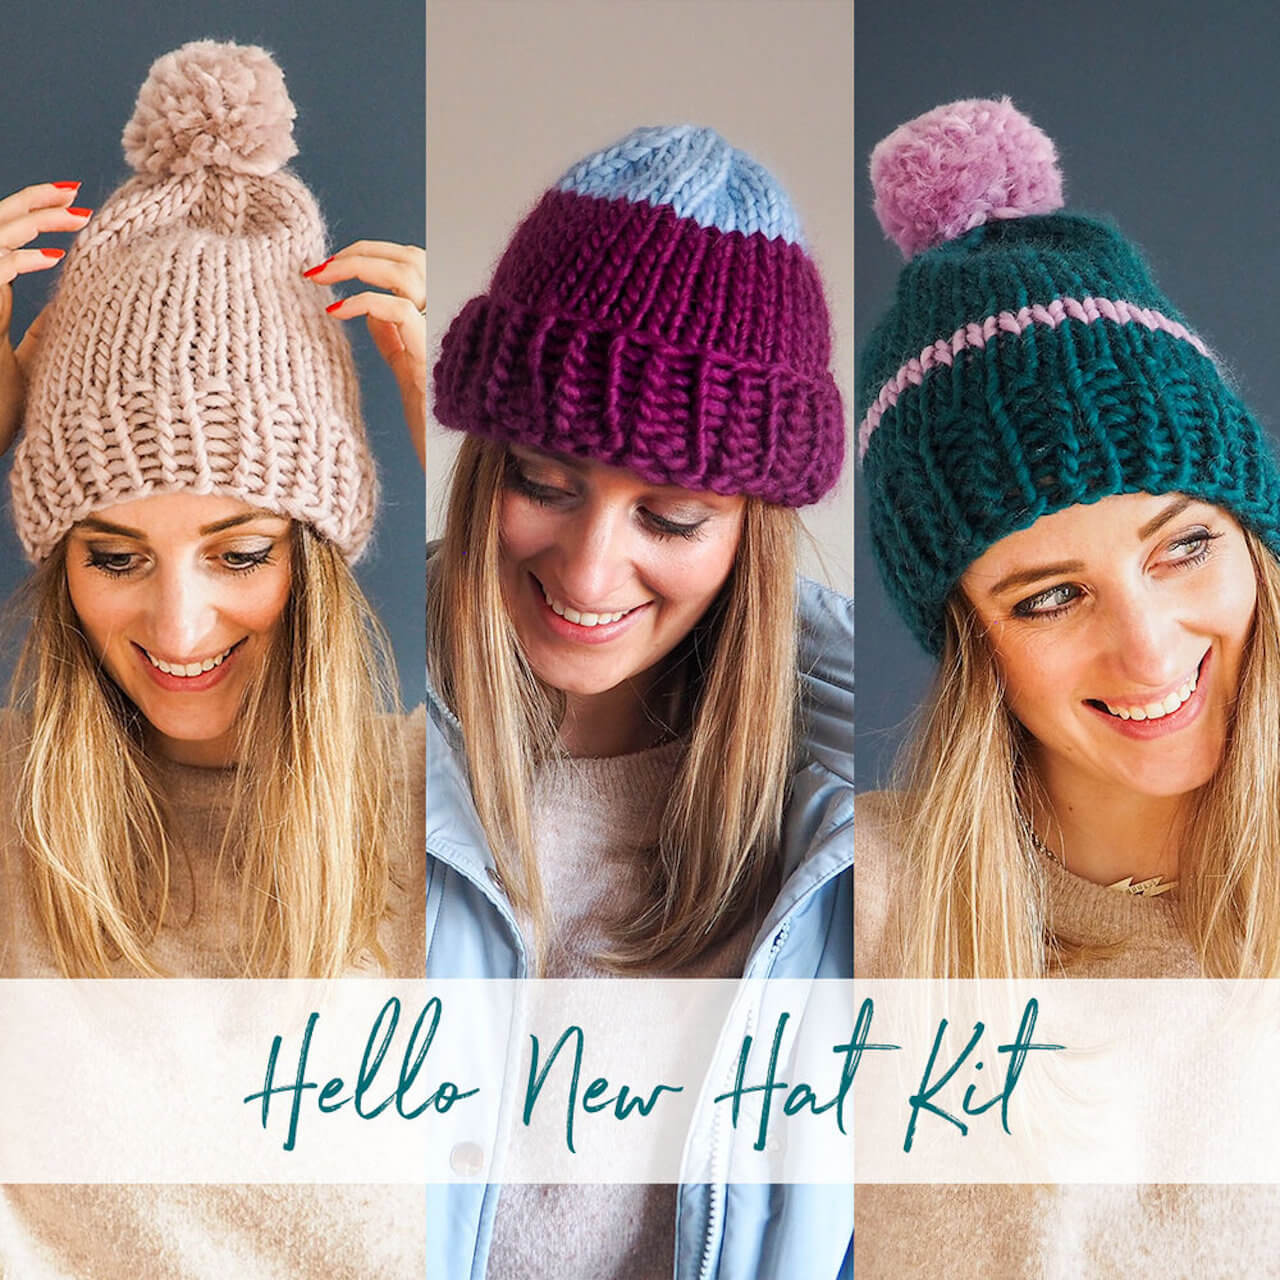 Hello New Hat!